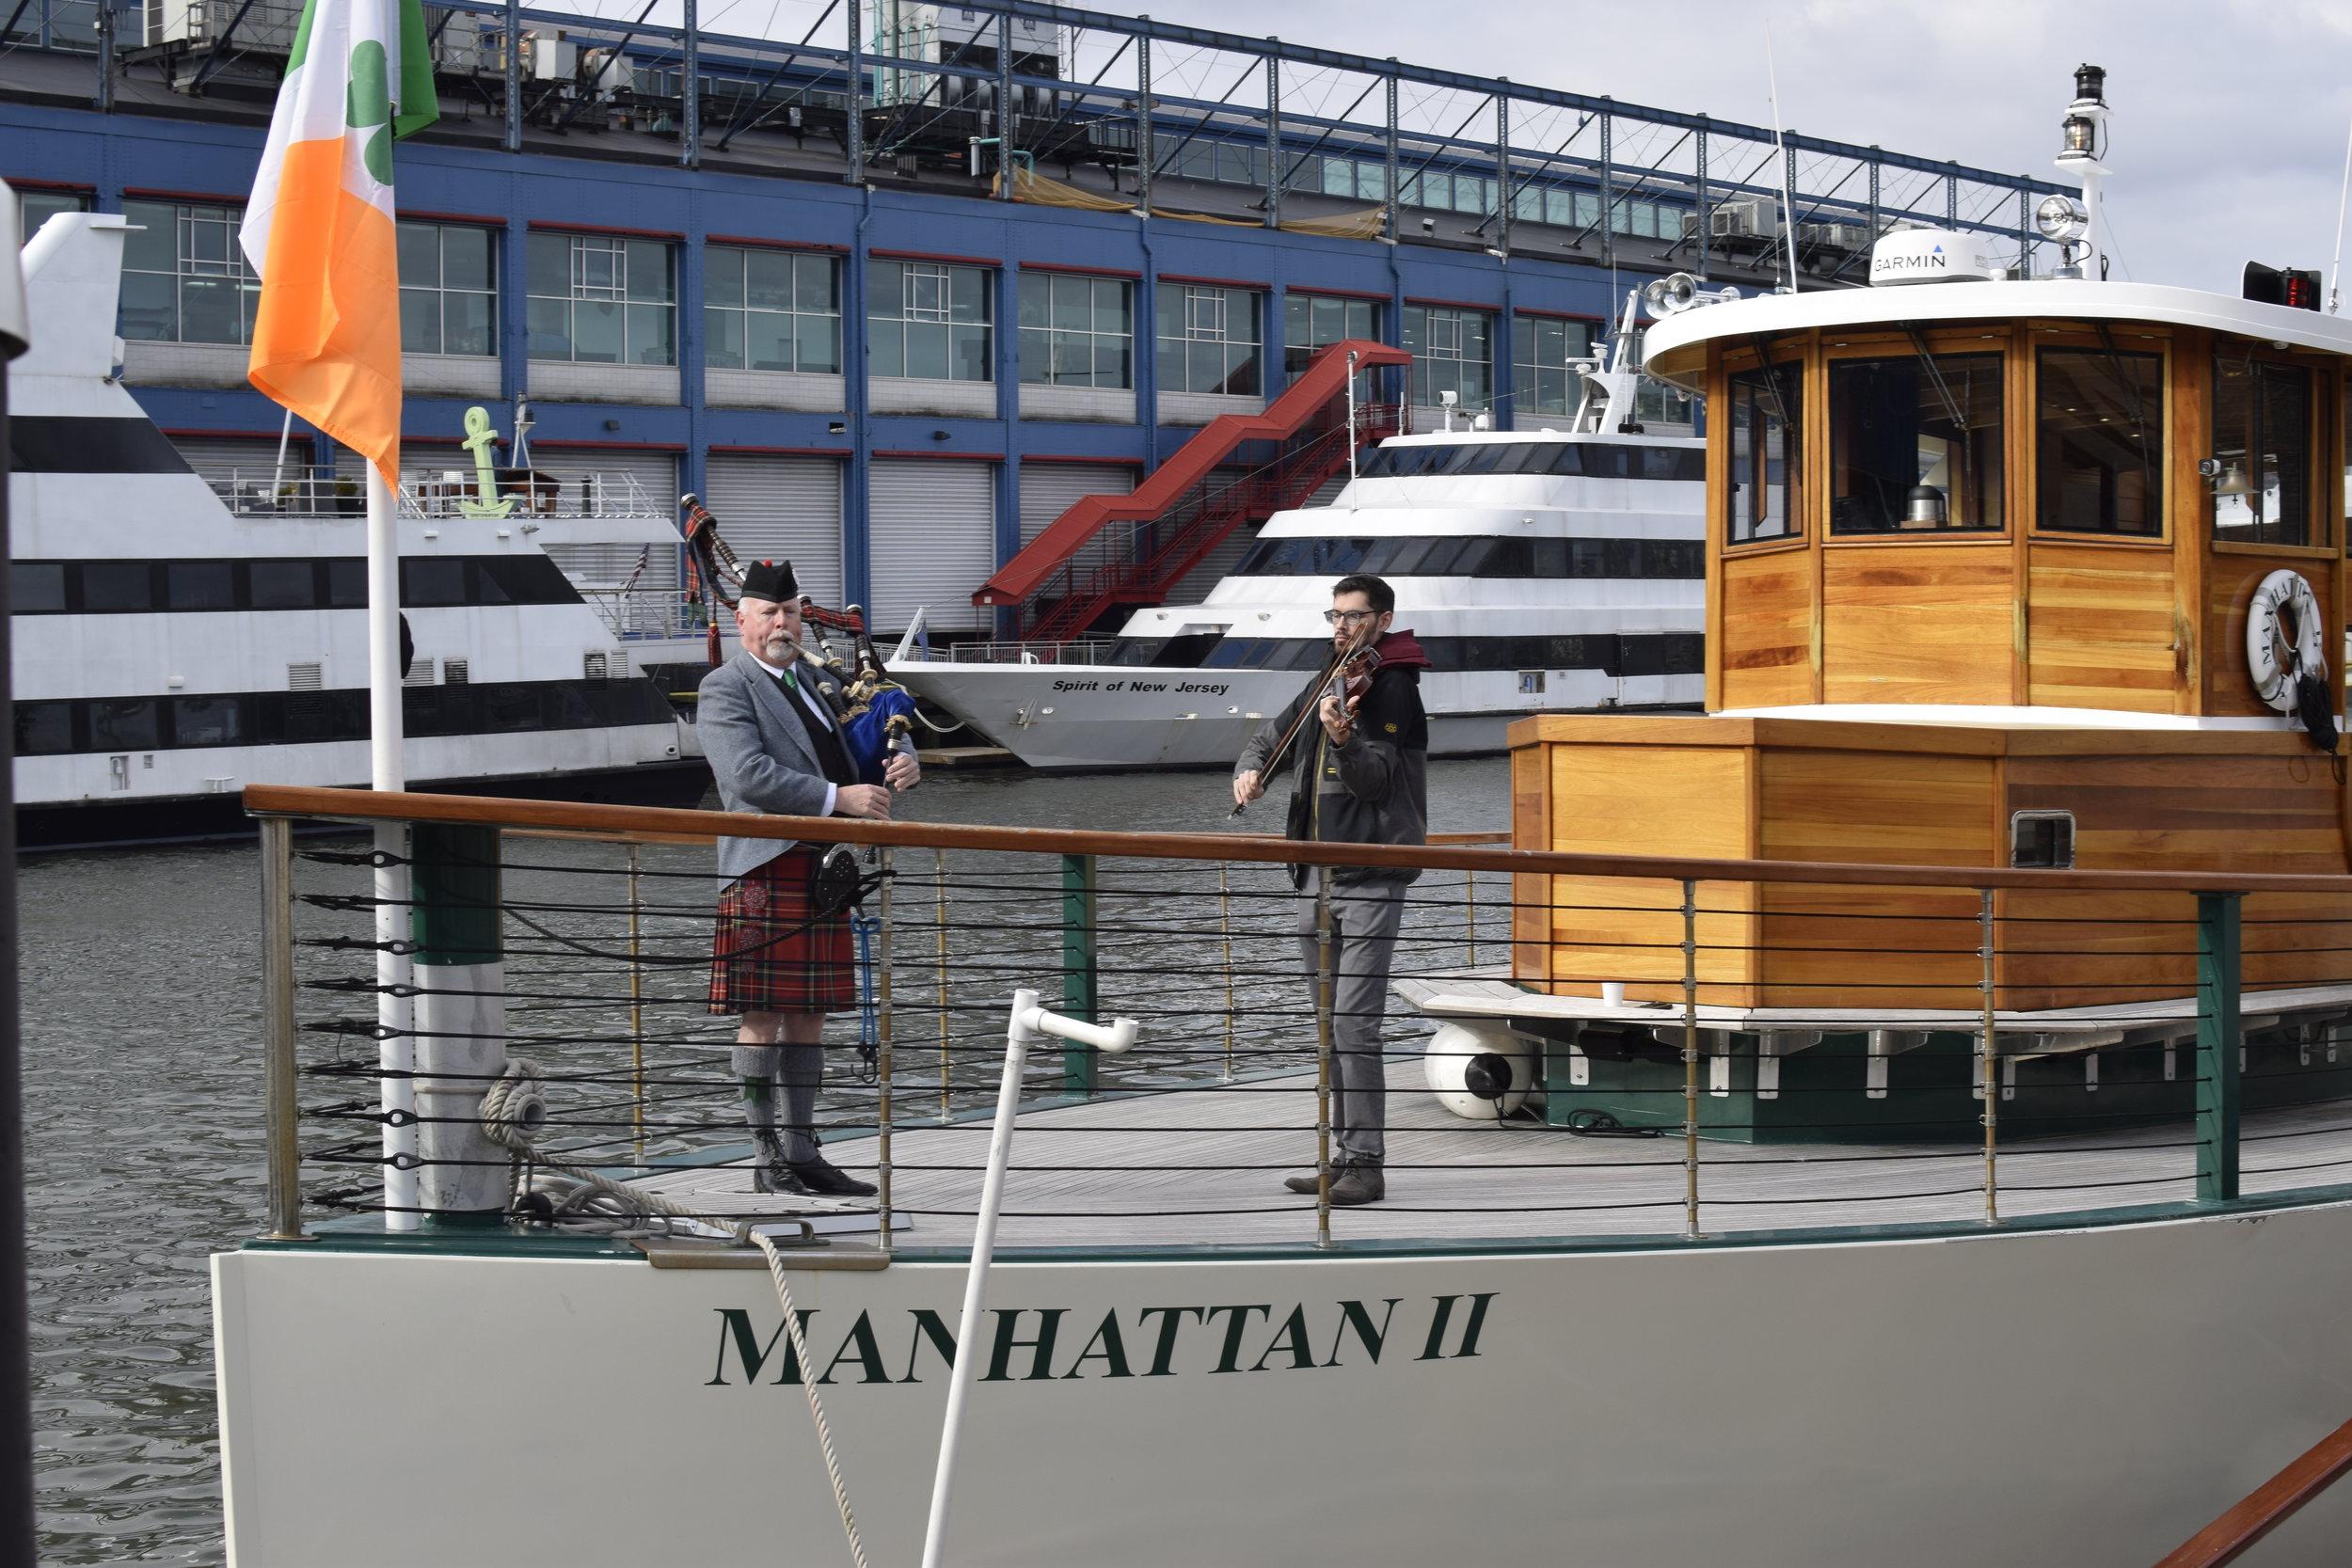 Bagpiper and Fiddler on Manhattan II